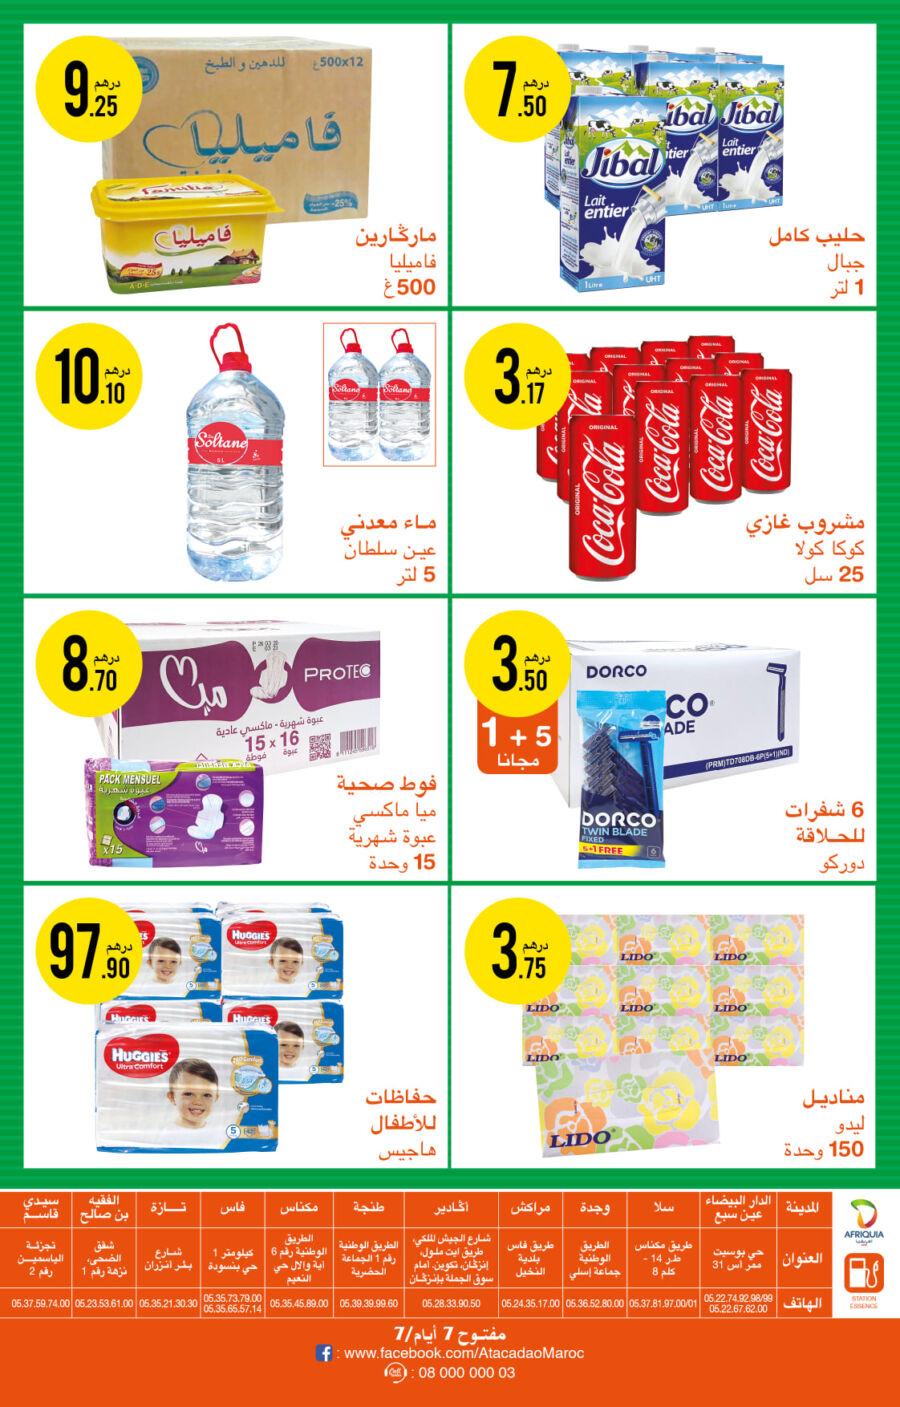 Catalogue Atacadao Maroc ما كاين ارخص du 18 Février au 3 Mars 2021